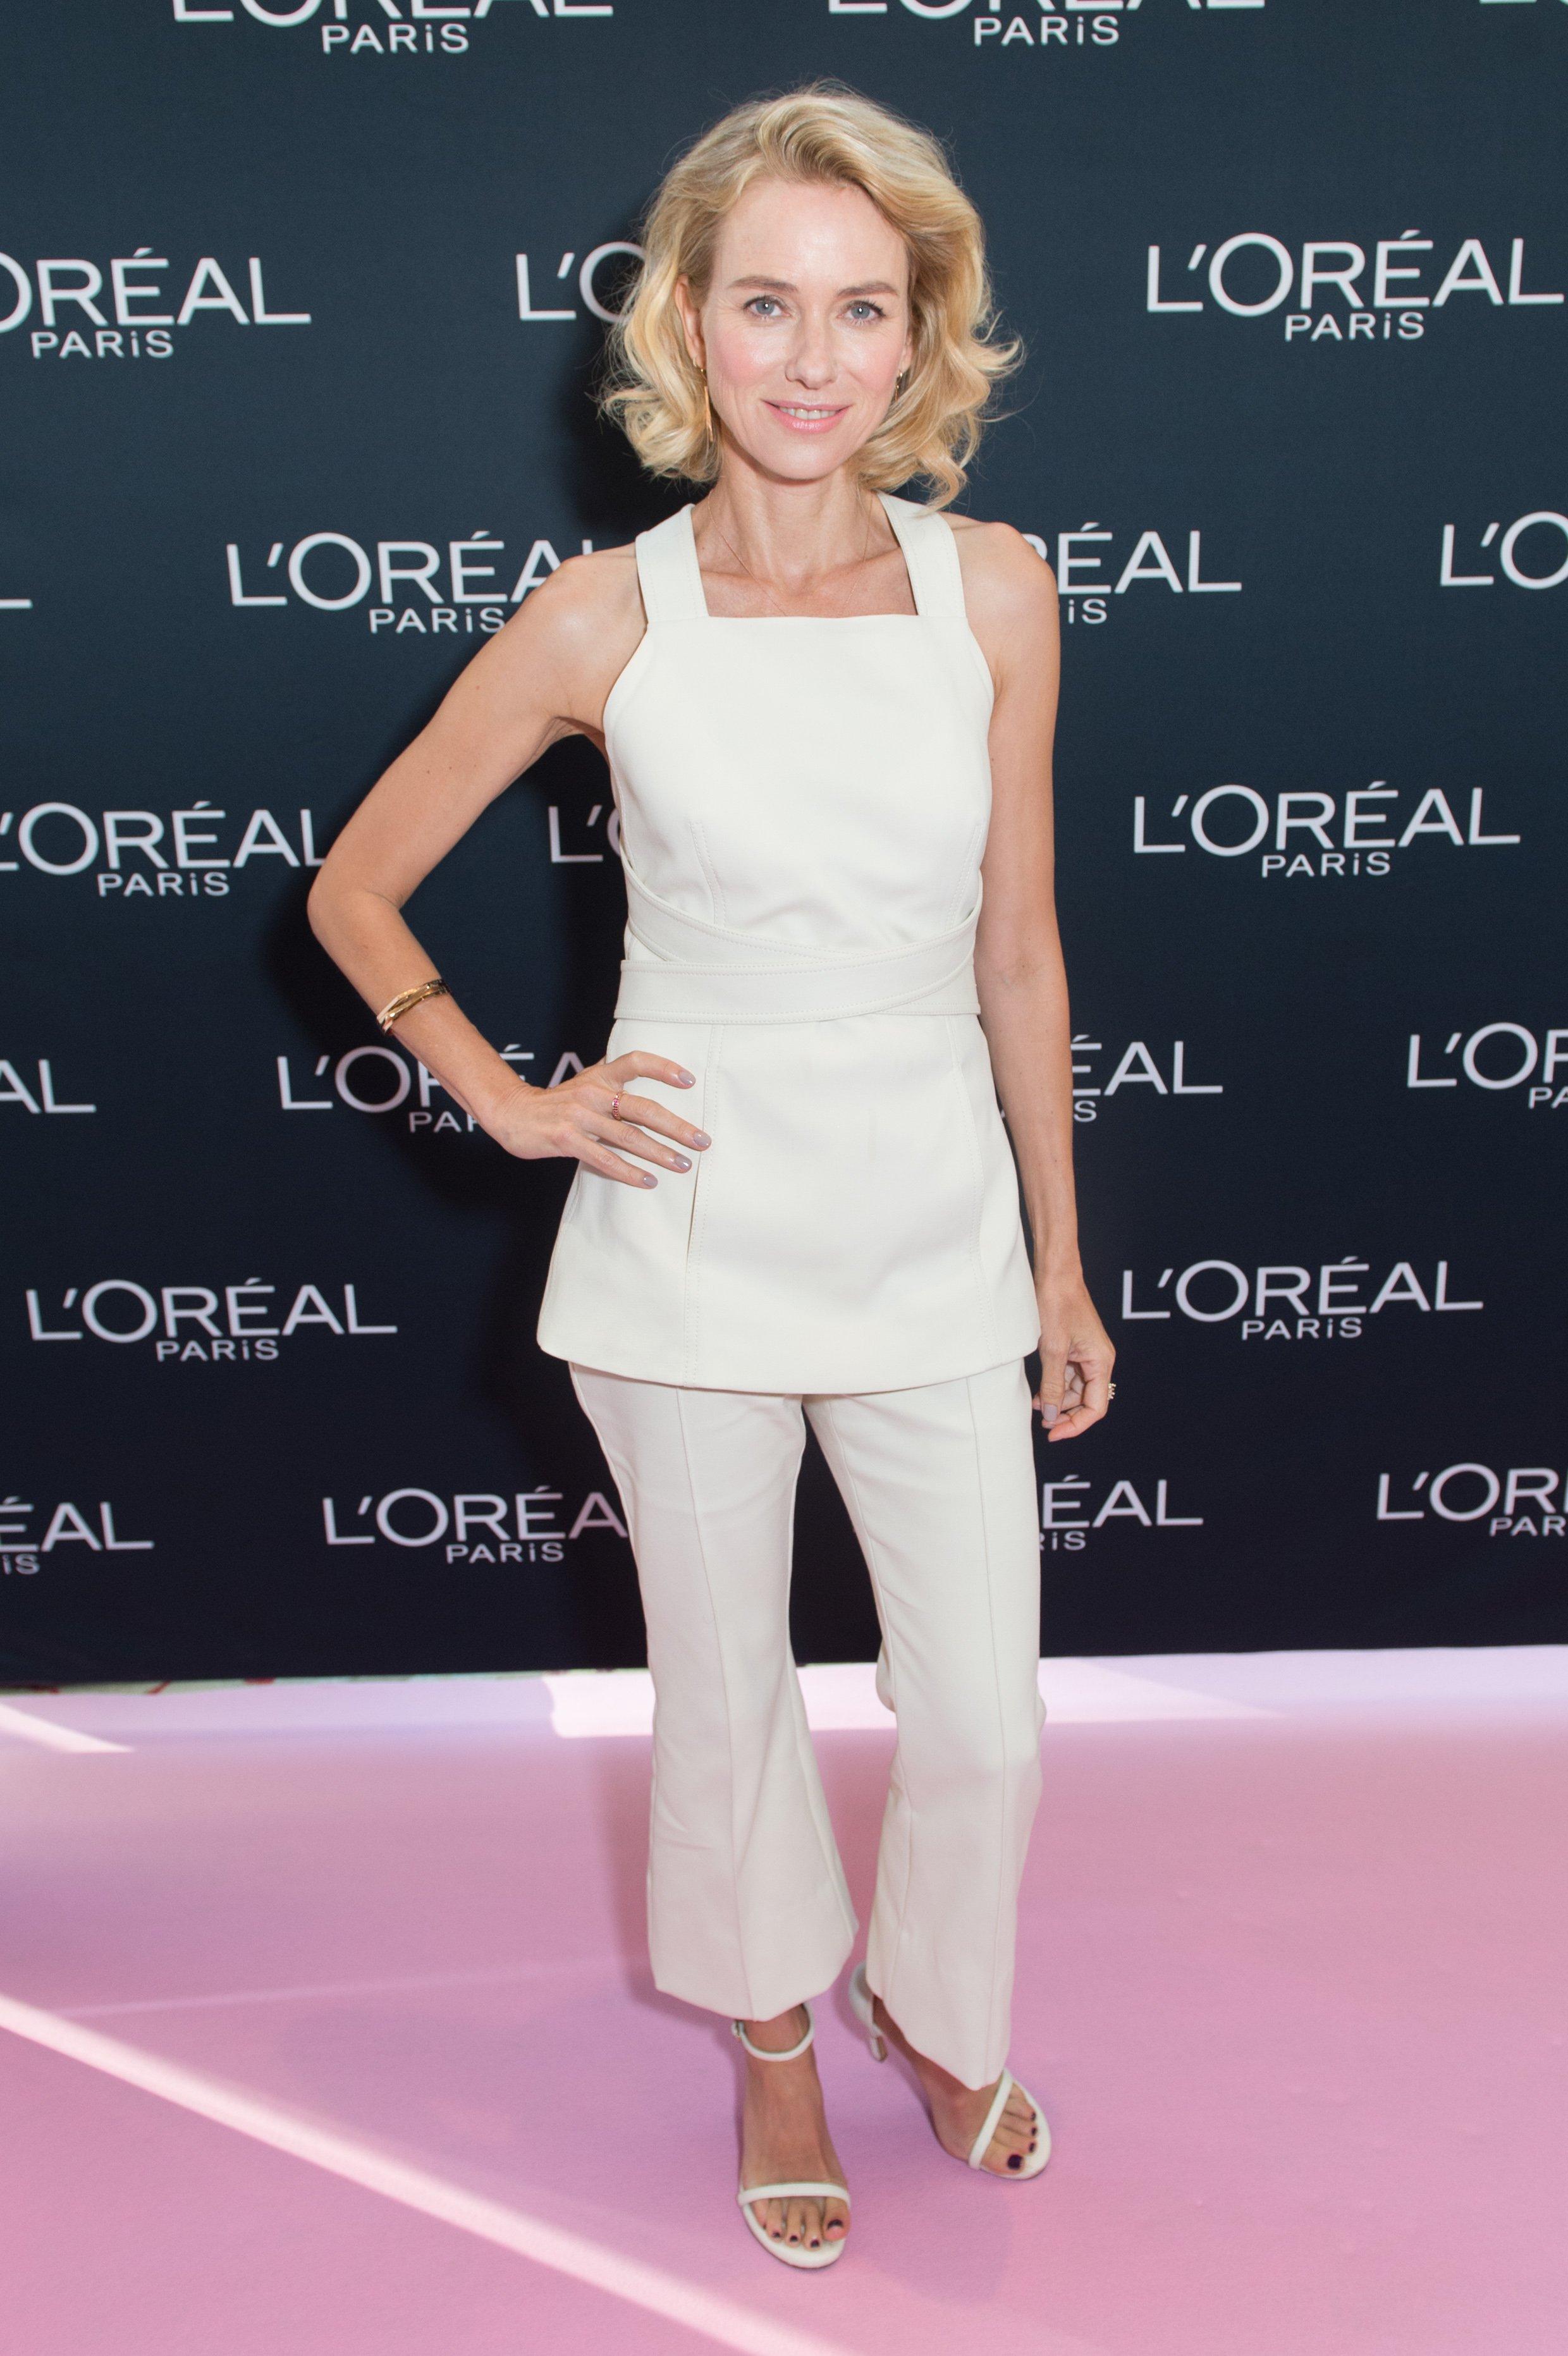 L'Oréal Naomi Watts